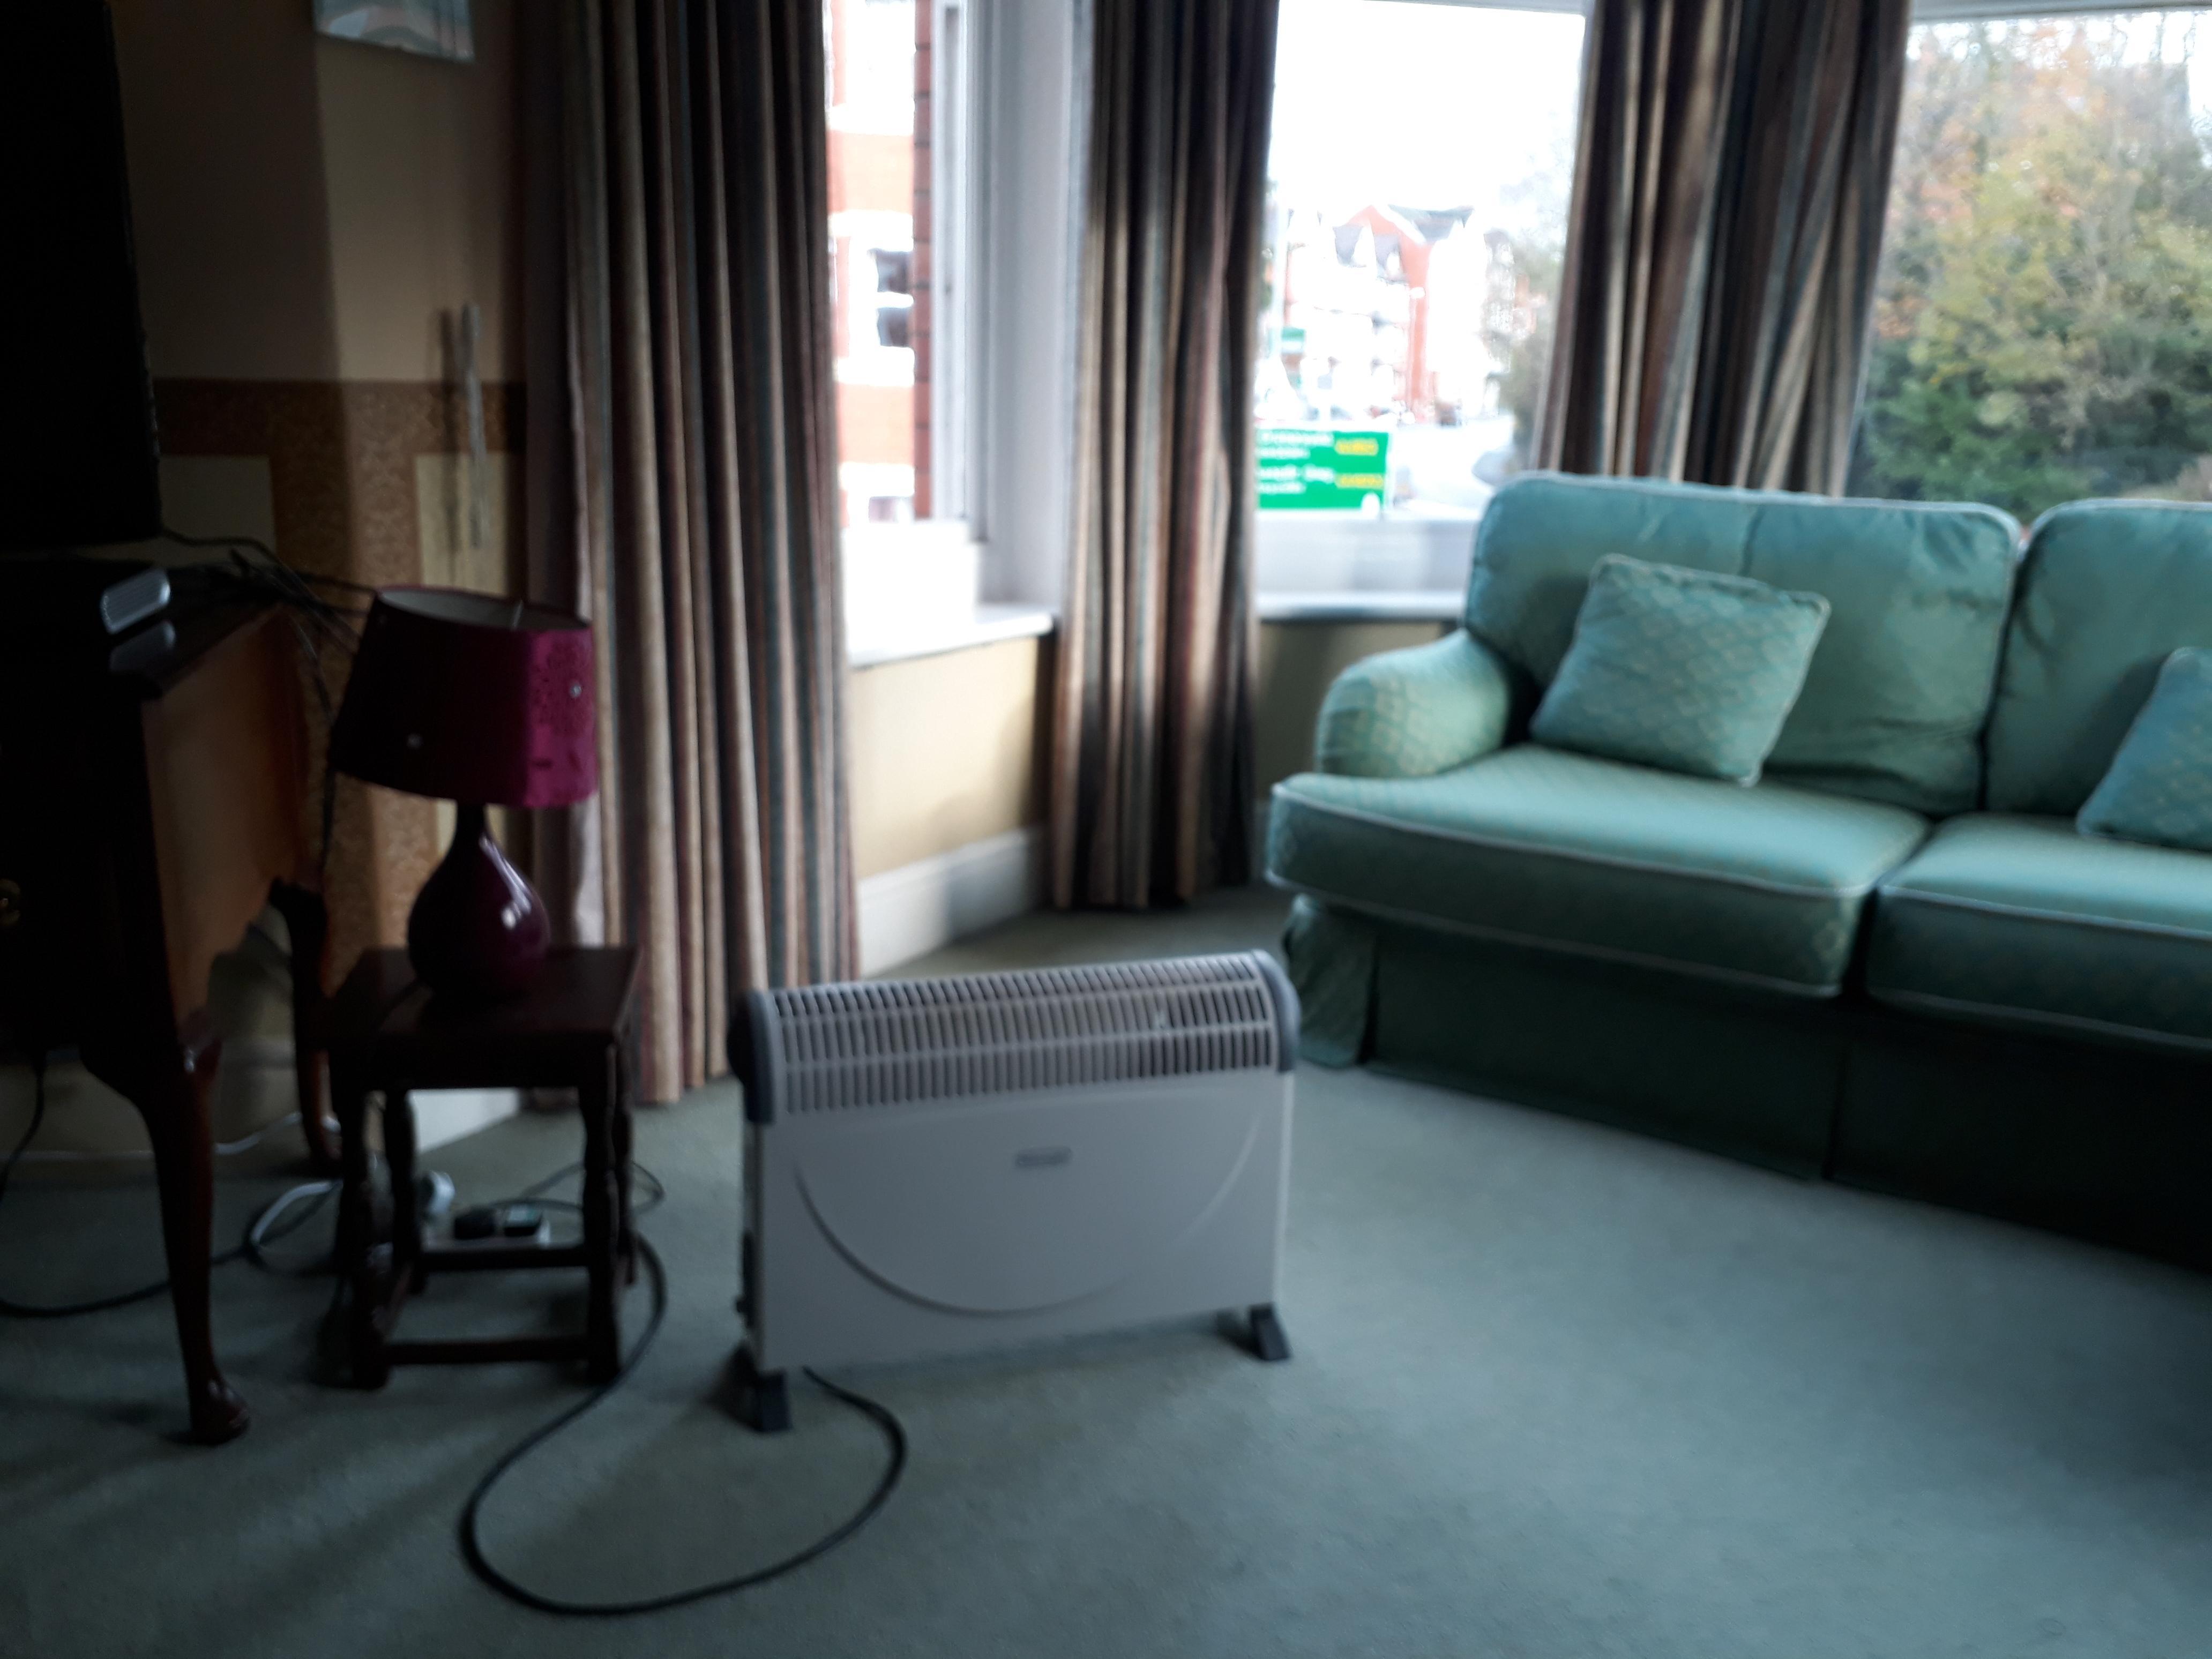 Room heating